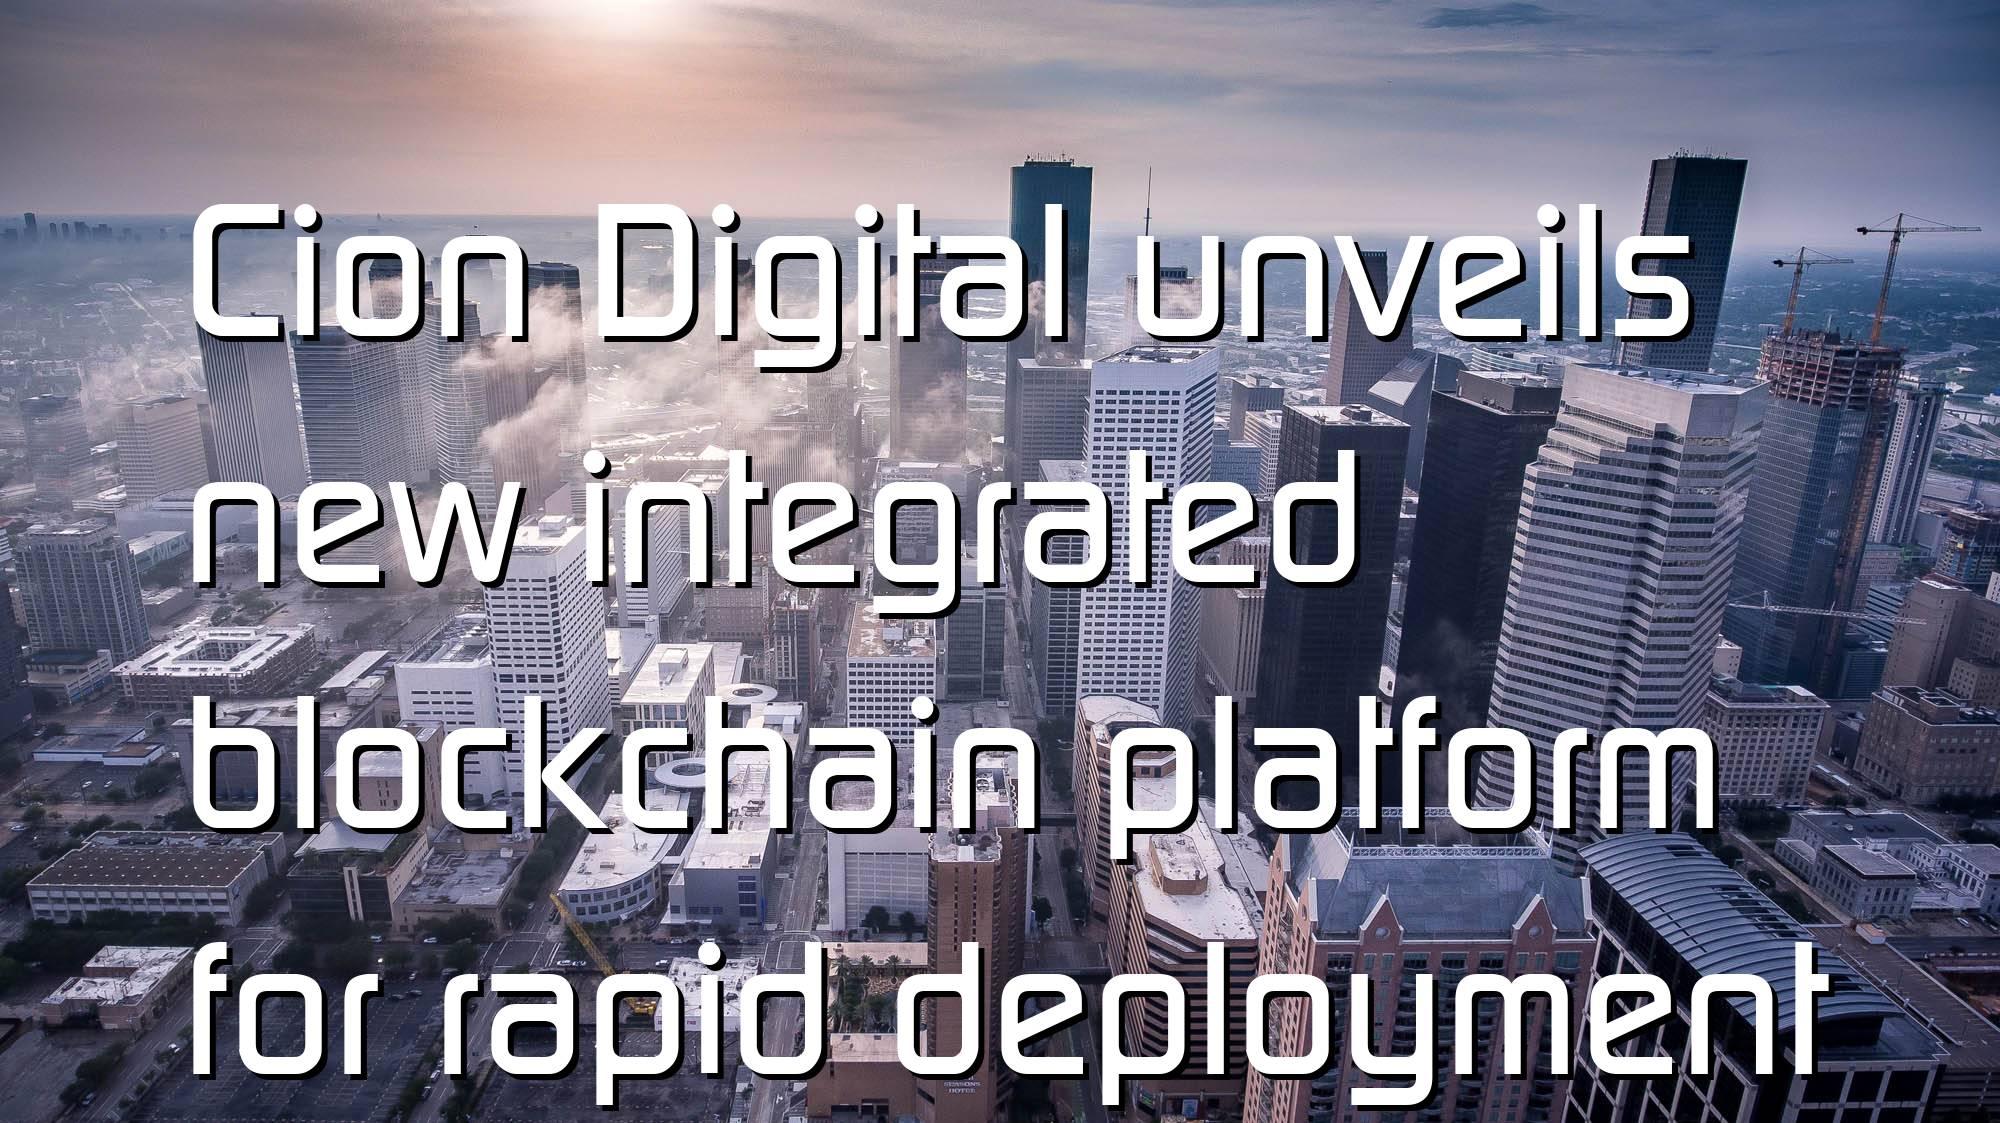 @$60566: Cion Digital unveils new integrated blockchain platform for rapid deployment of crypto protocols